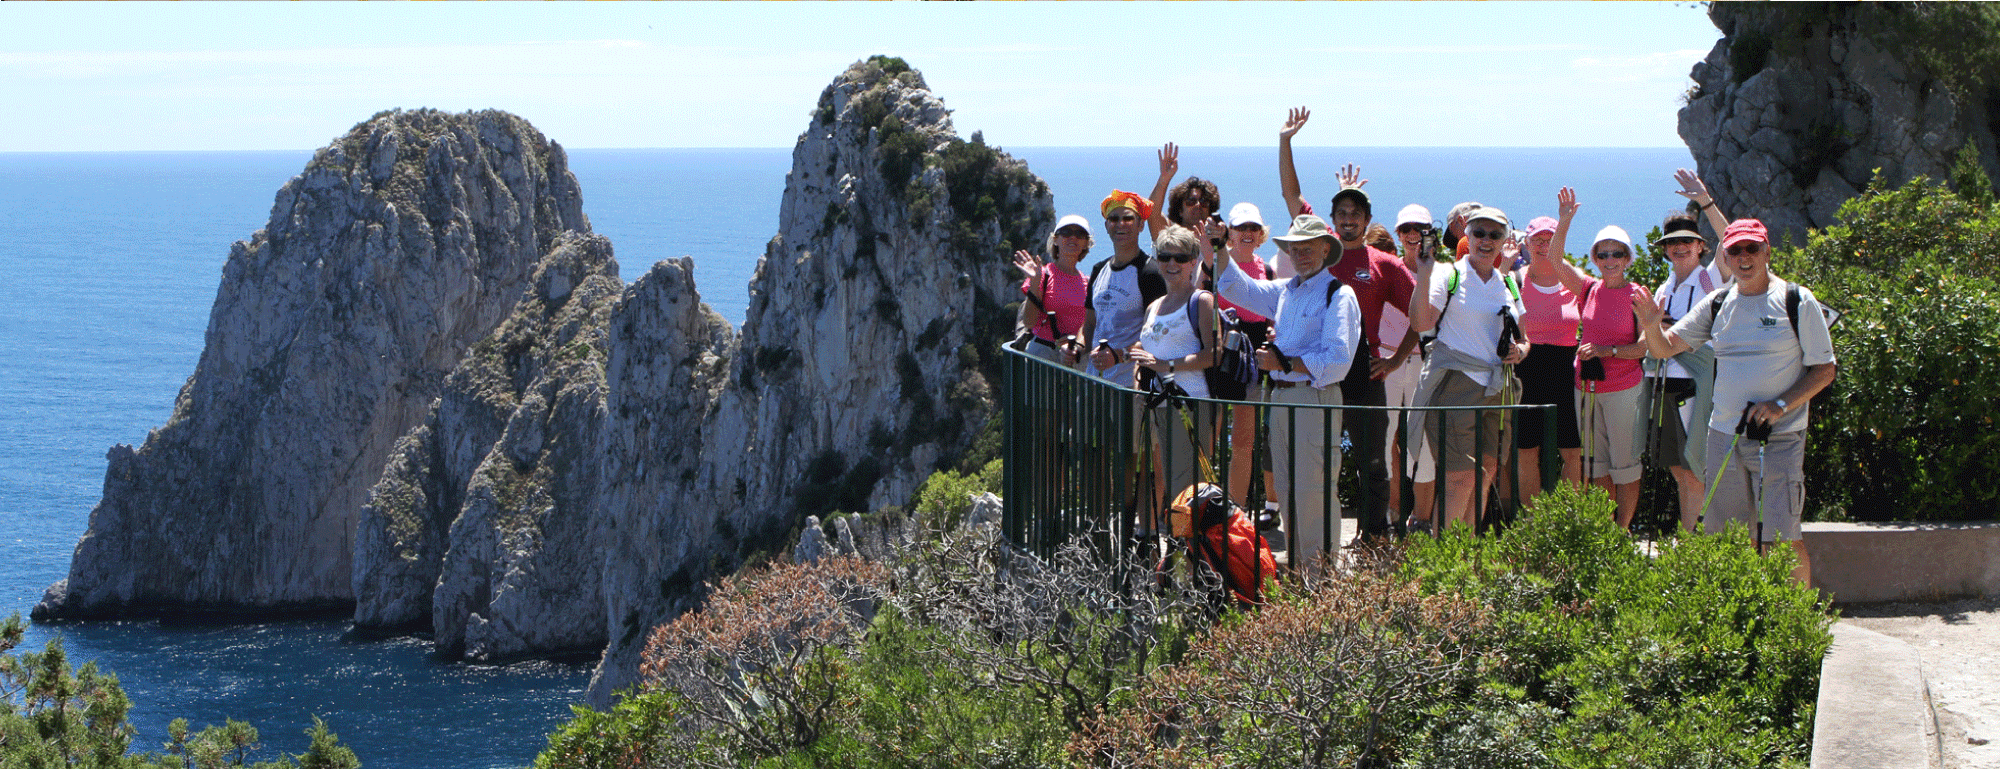 Group Travel Faq S Vbt Bicycling And Walking Vacations